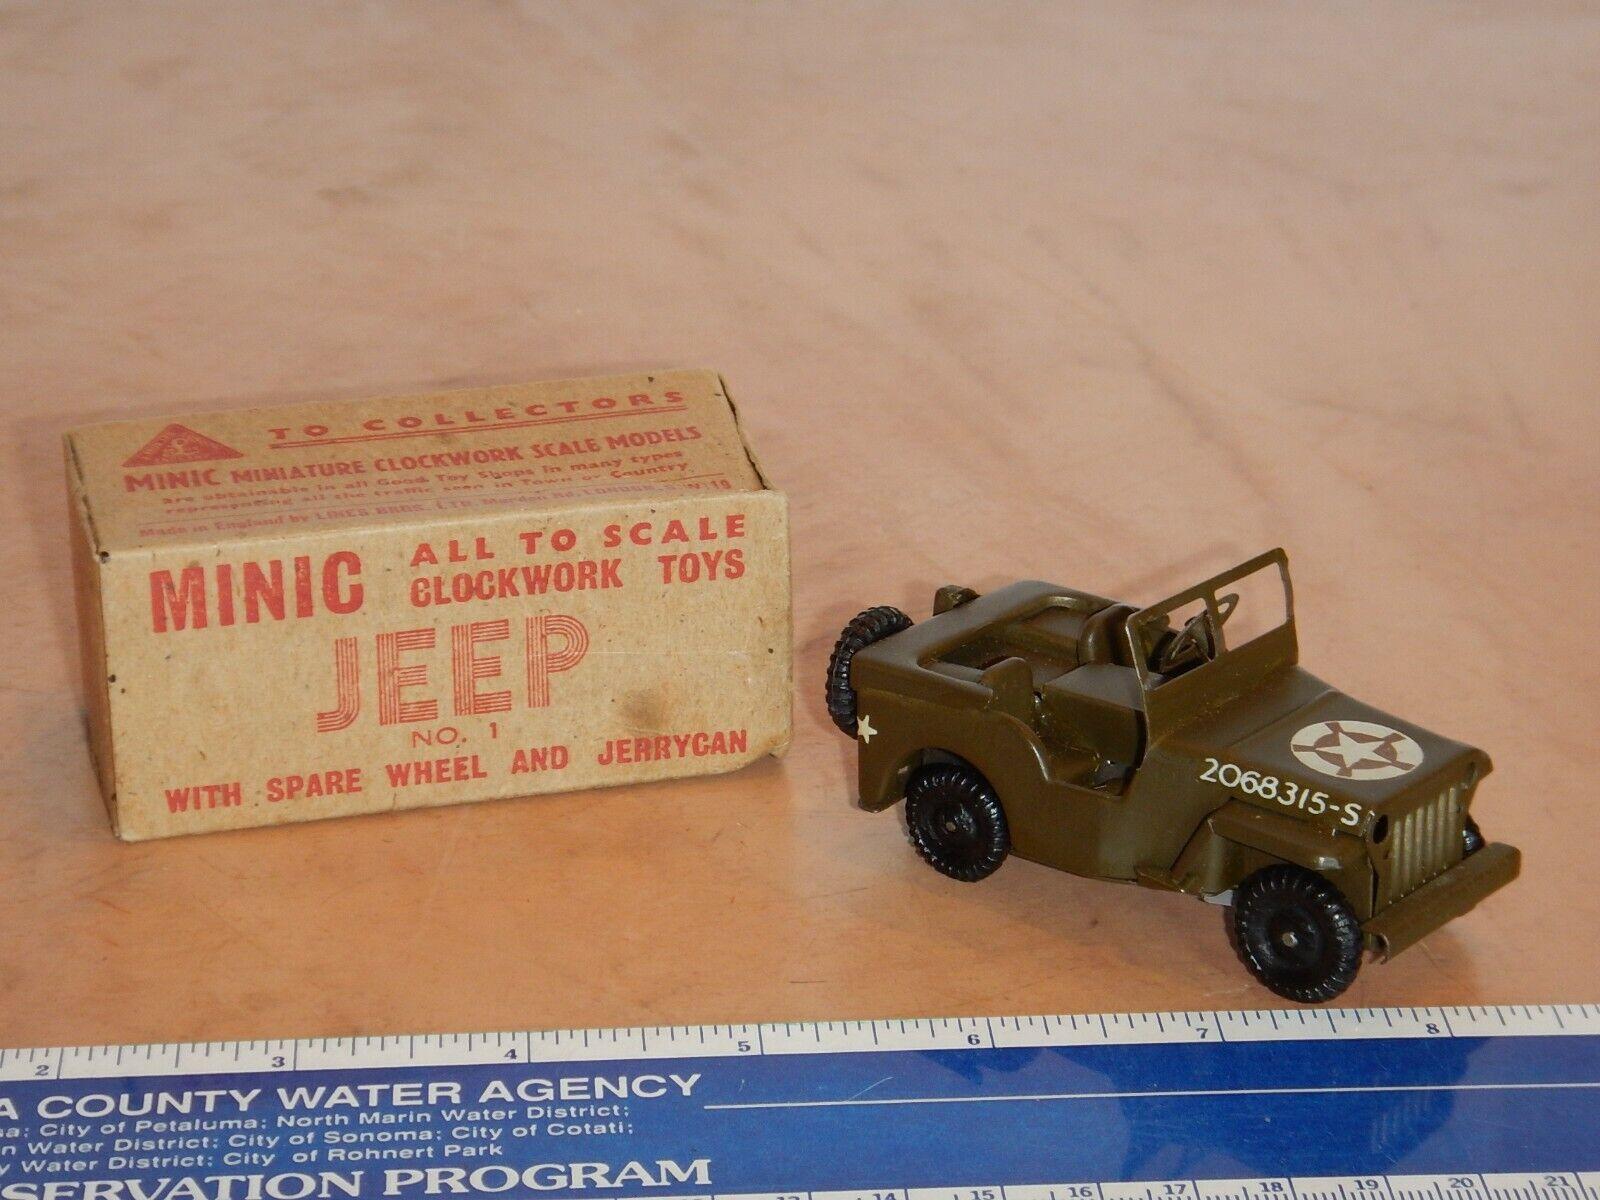 VINTAGE TRIANG MINIC U.S. ARMY JEEP, CLOCKWORK WIND-UP WITH ORIGINAL BOX, WORKS